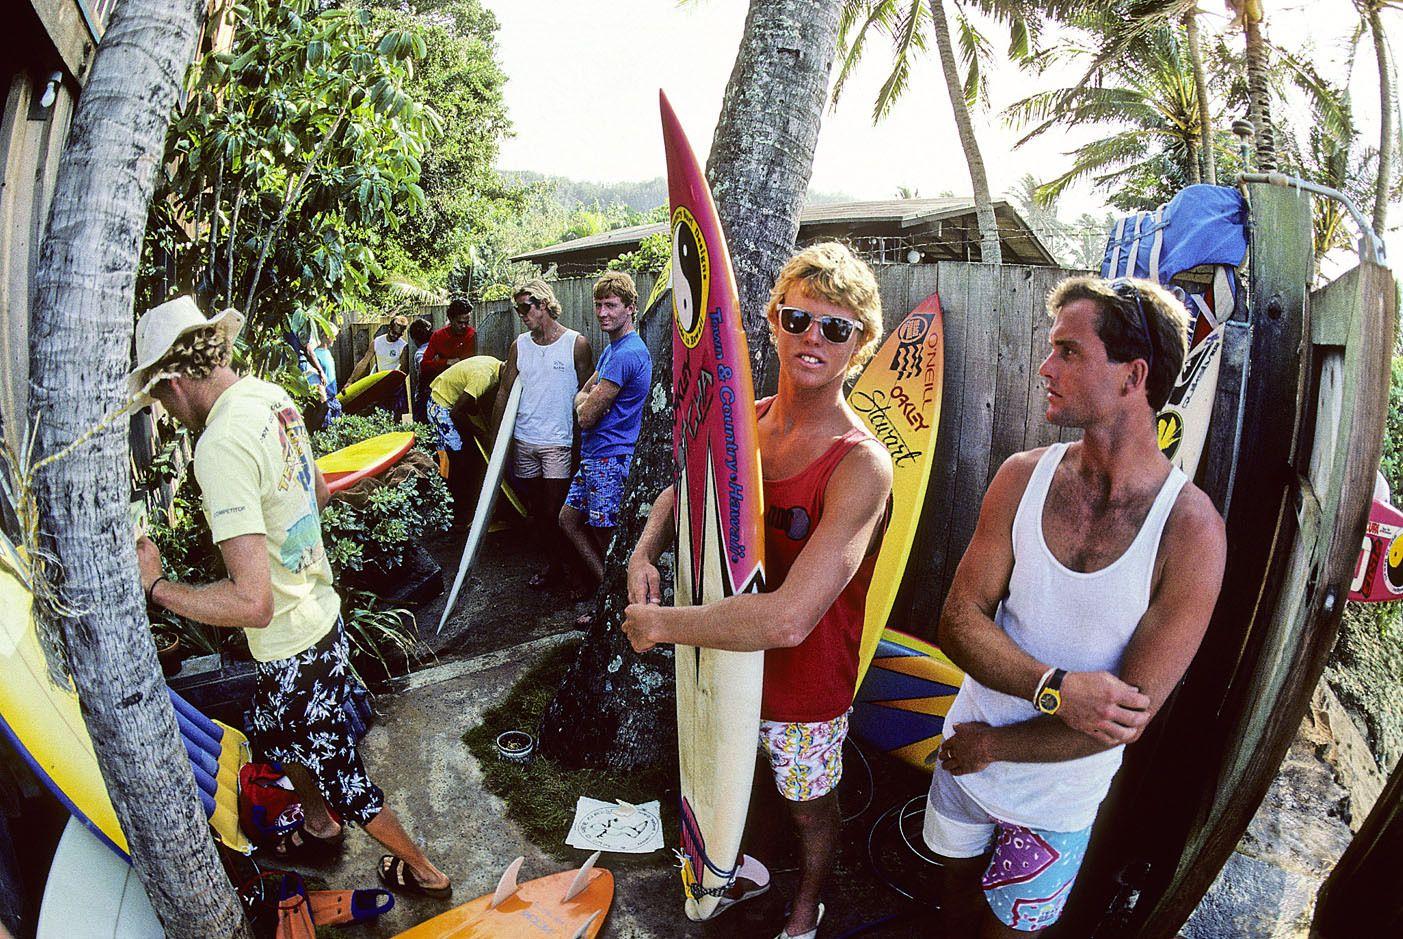 MATT ARCHIBOLD, PETER MCGONAGLE, PIPELINE, OAHU, HI. 1985.